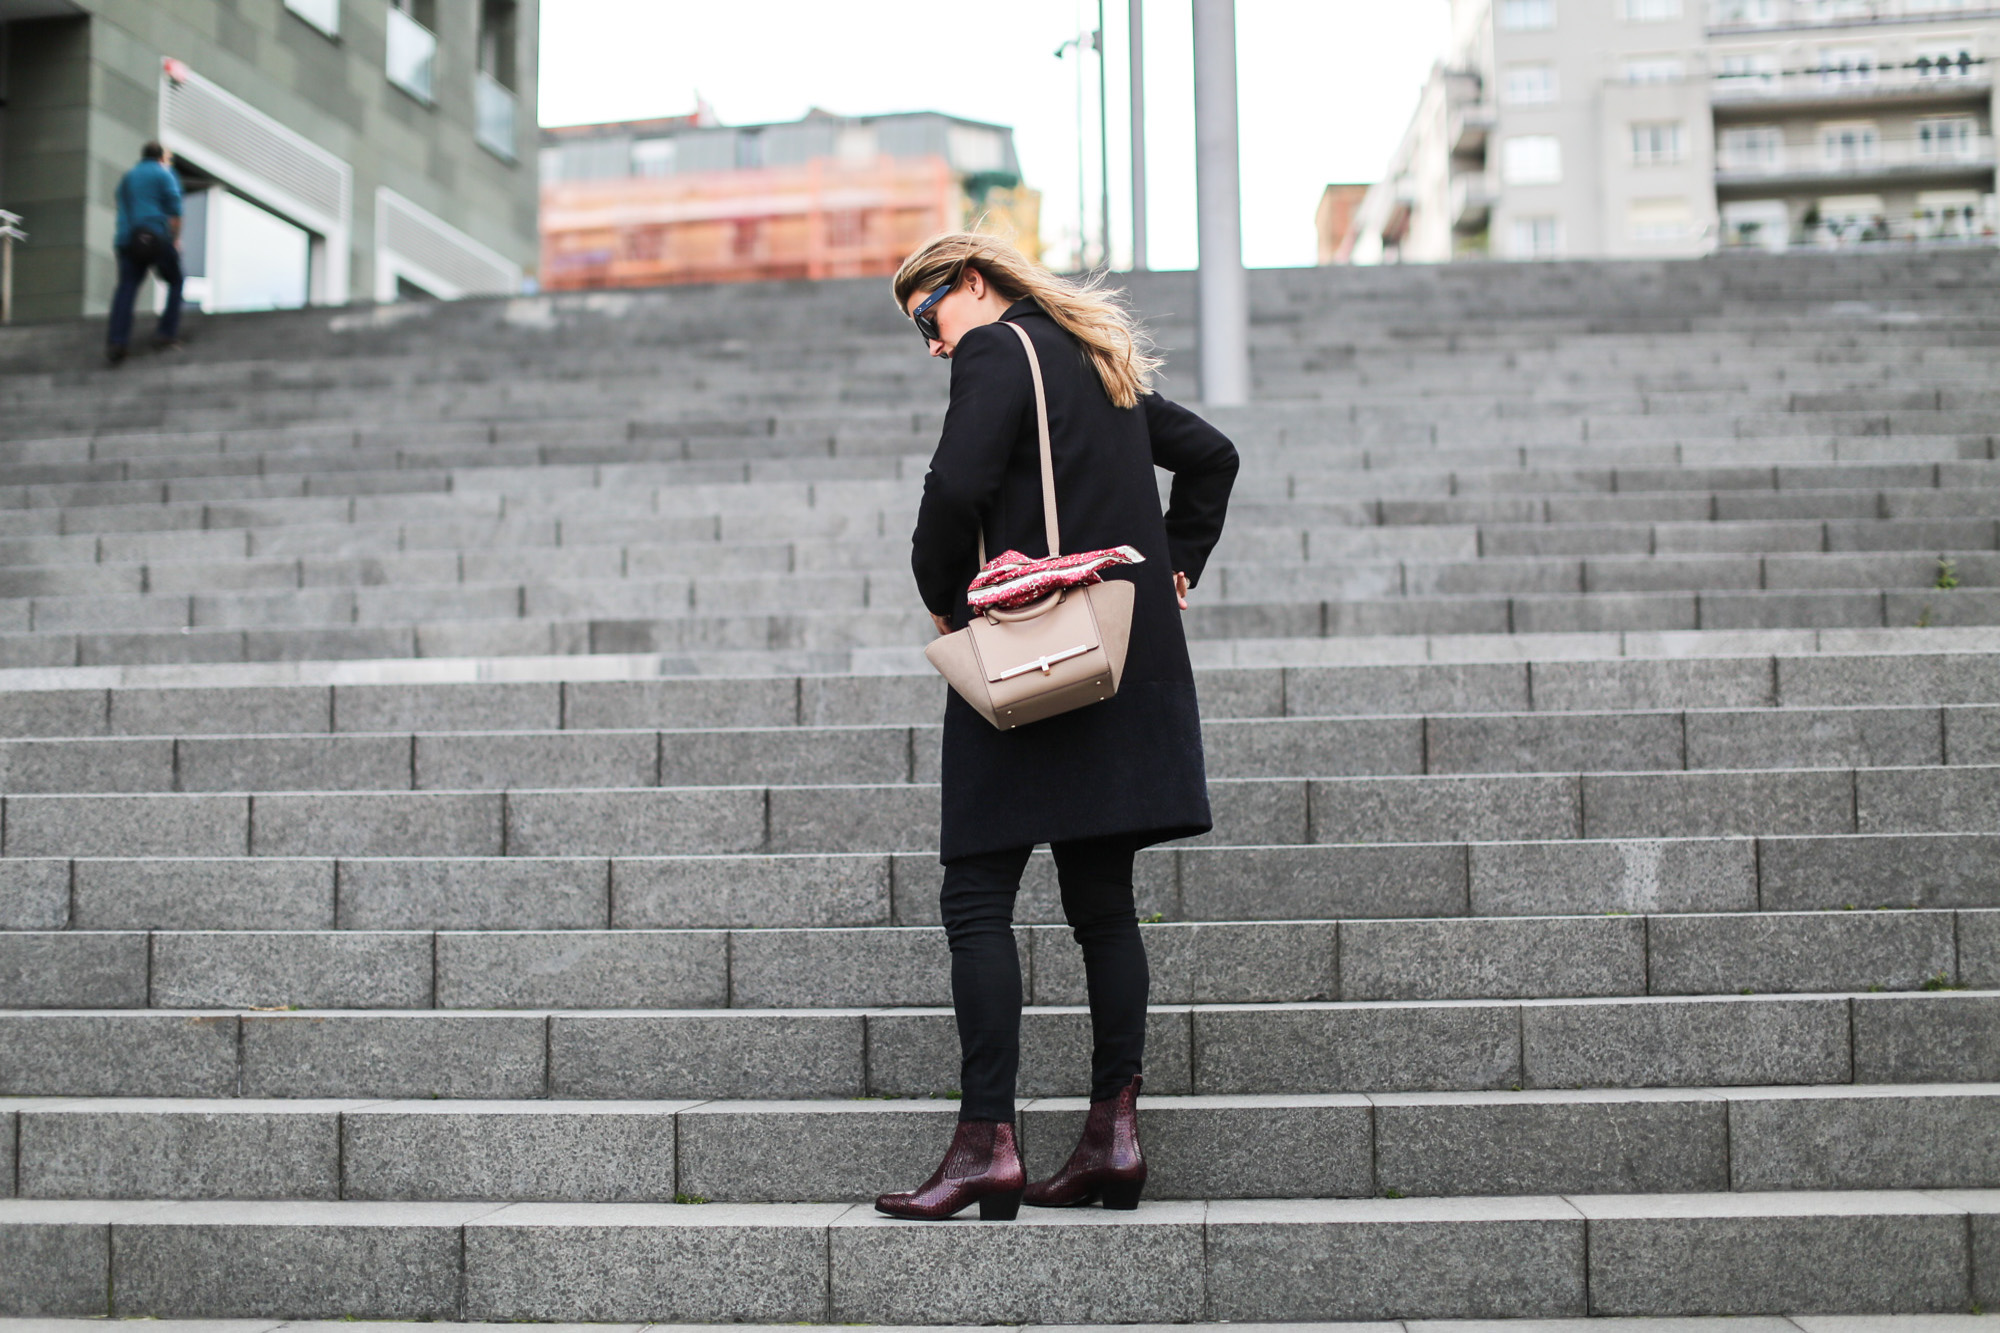 clochet_streetstyle_fashionbloggerbilbao_sandro_phytonleatherankleboots_purificaciongarcia_bolsopiel-3